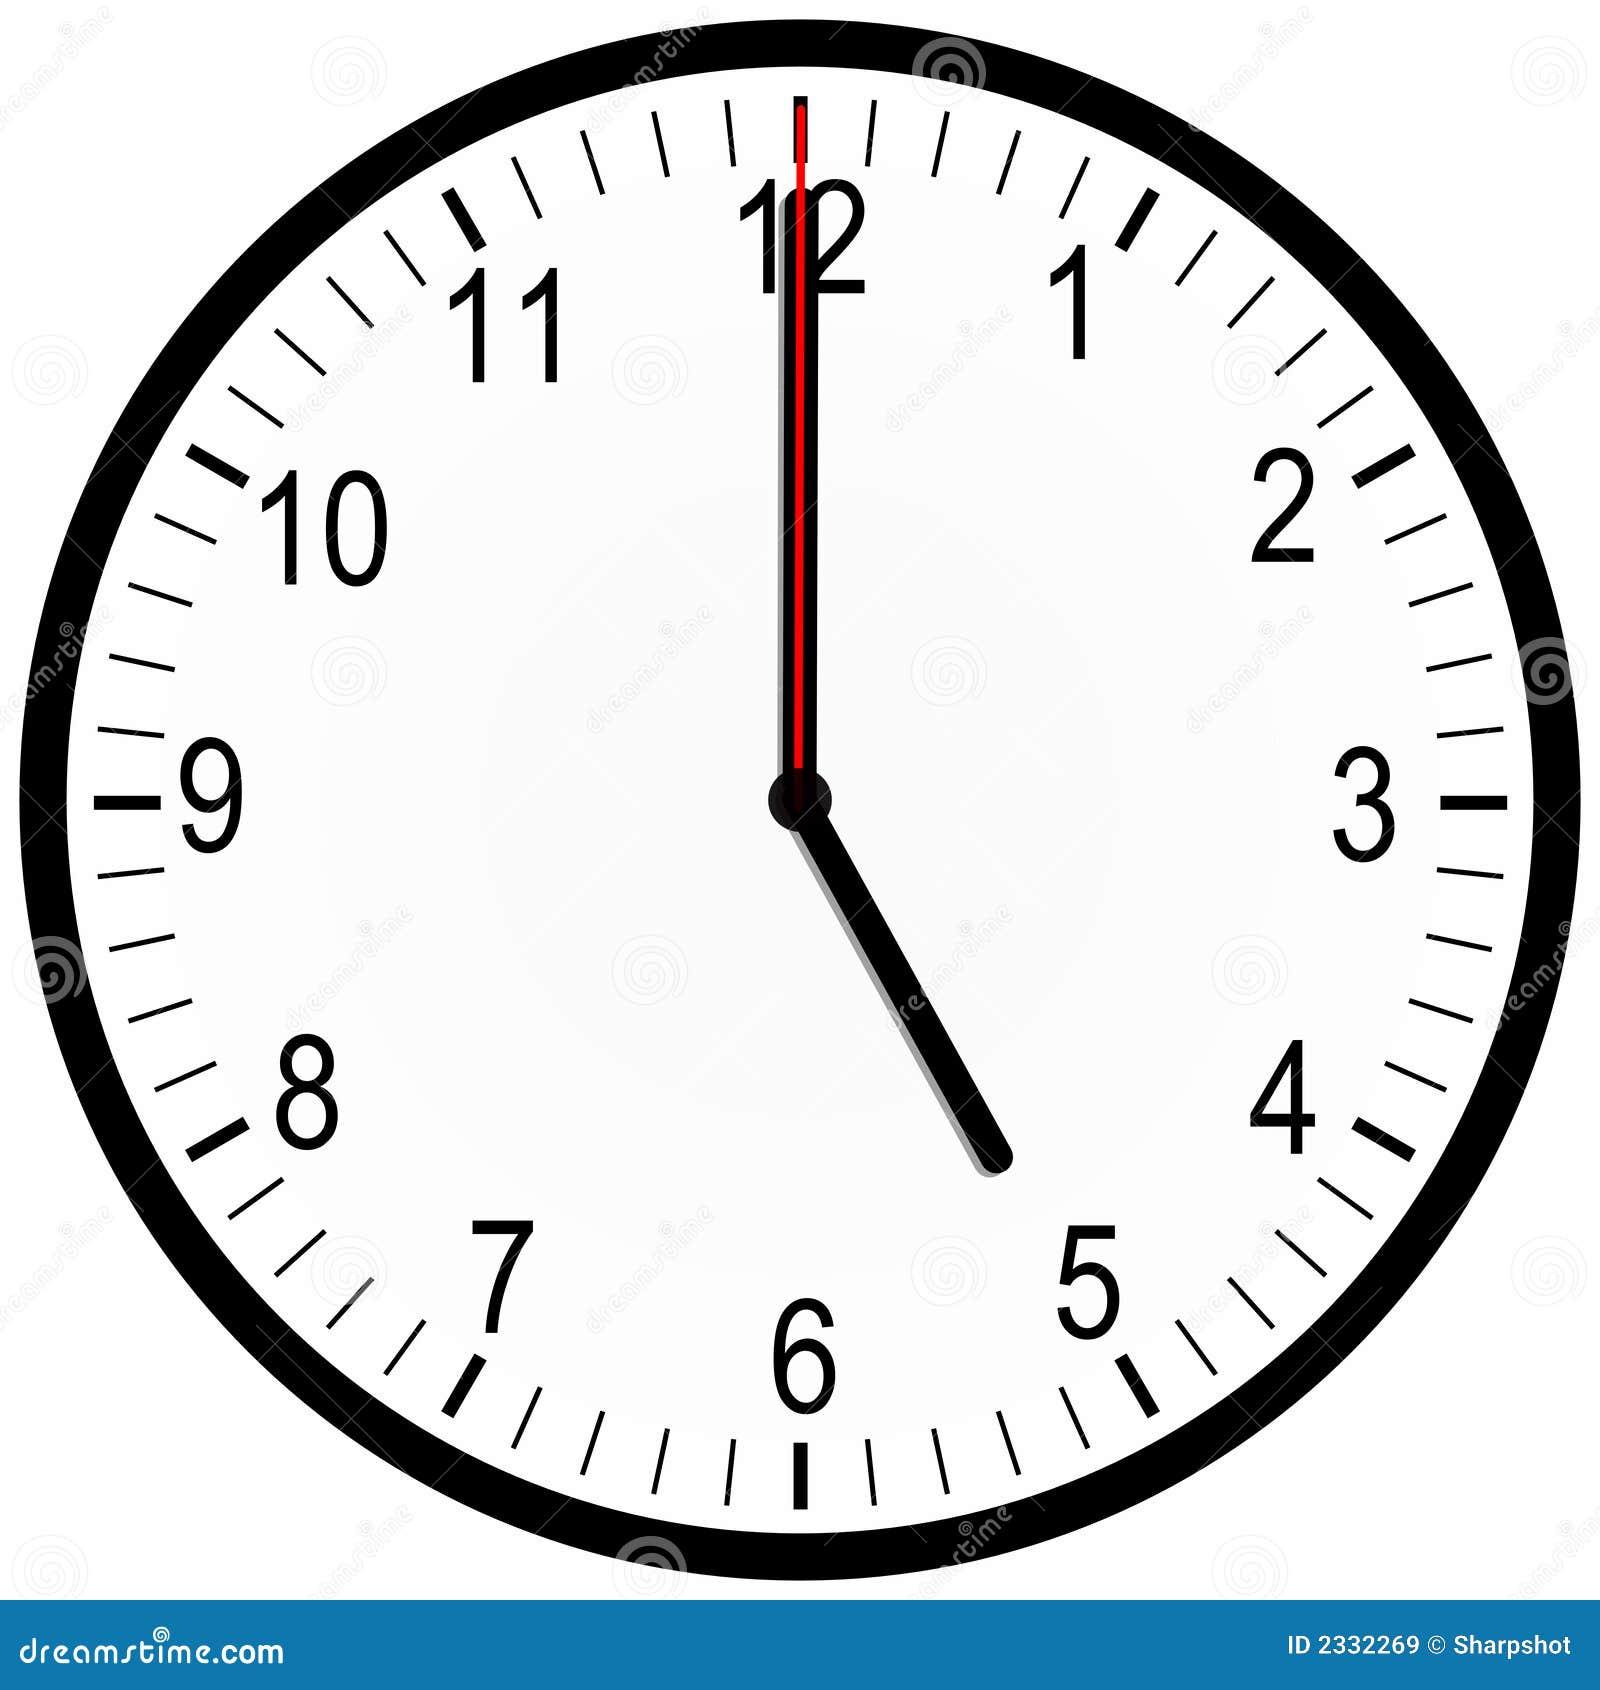 horloge de bureau 5 heures images libres de droits image 2332269. Black Bedroom Furniture Sets. Home Design Ideas